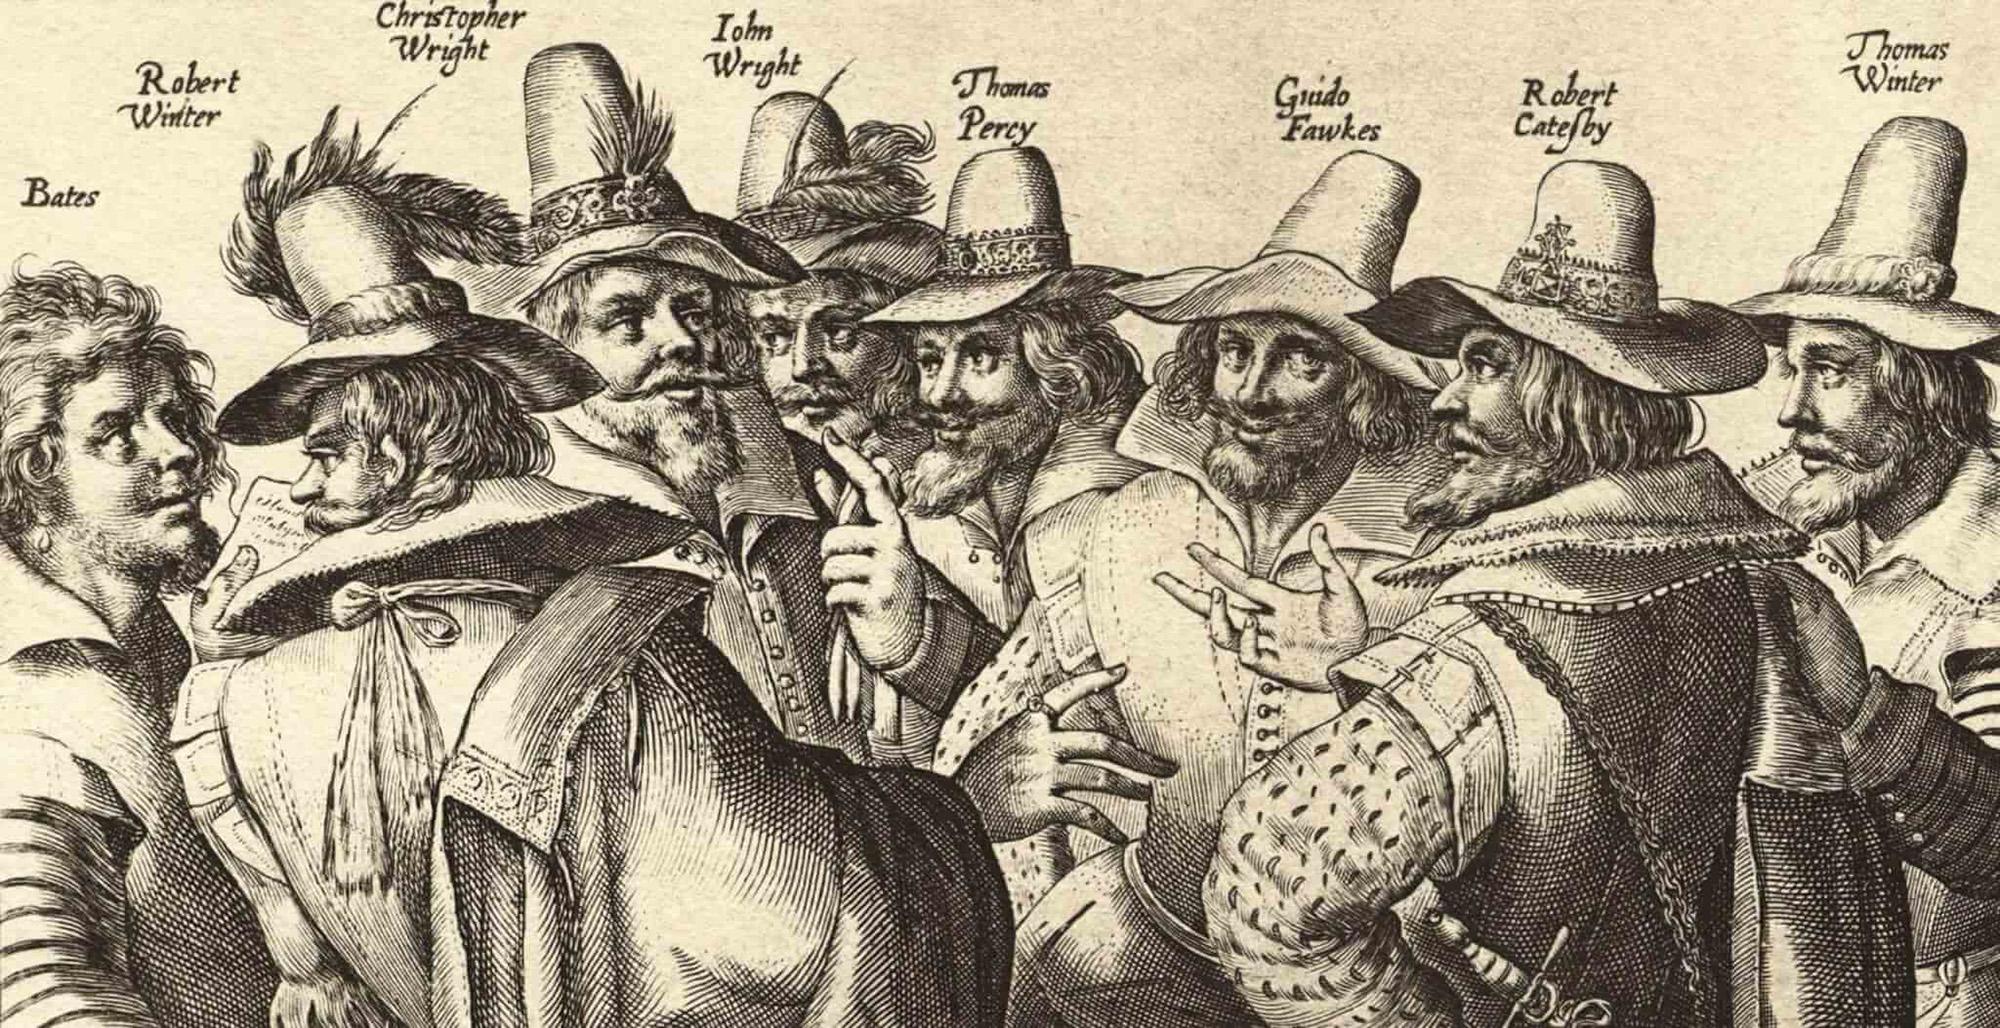 Illustration of the conspirators of the Gunpowder Plot